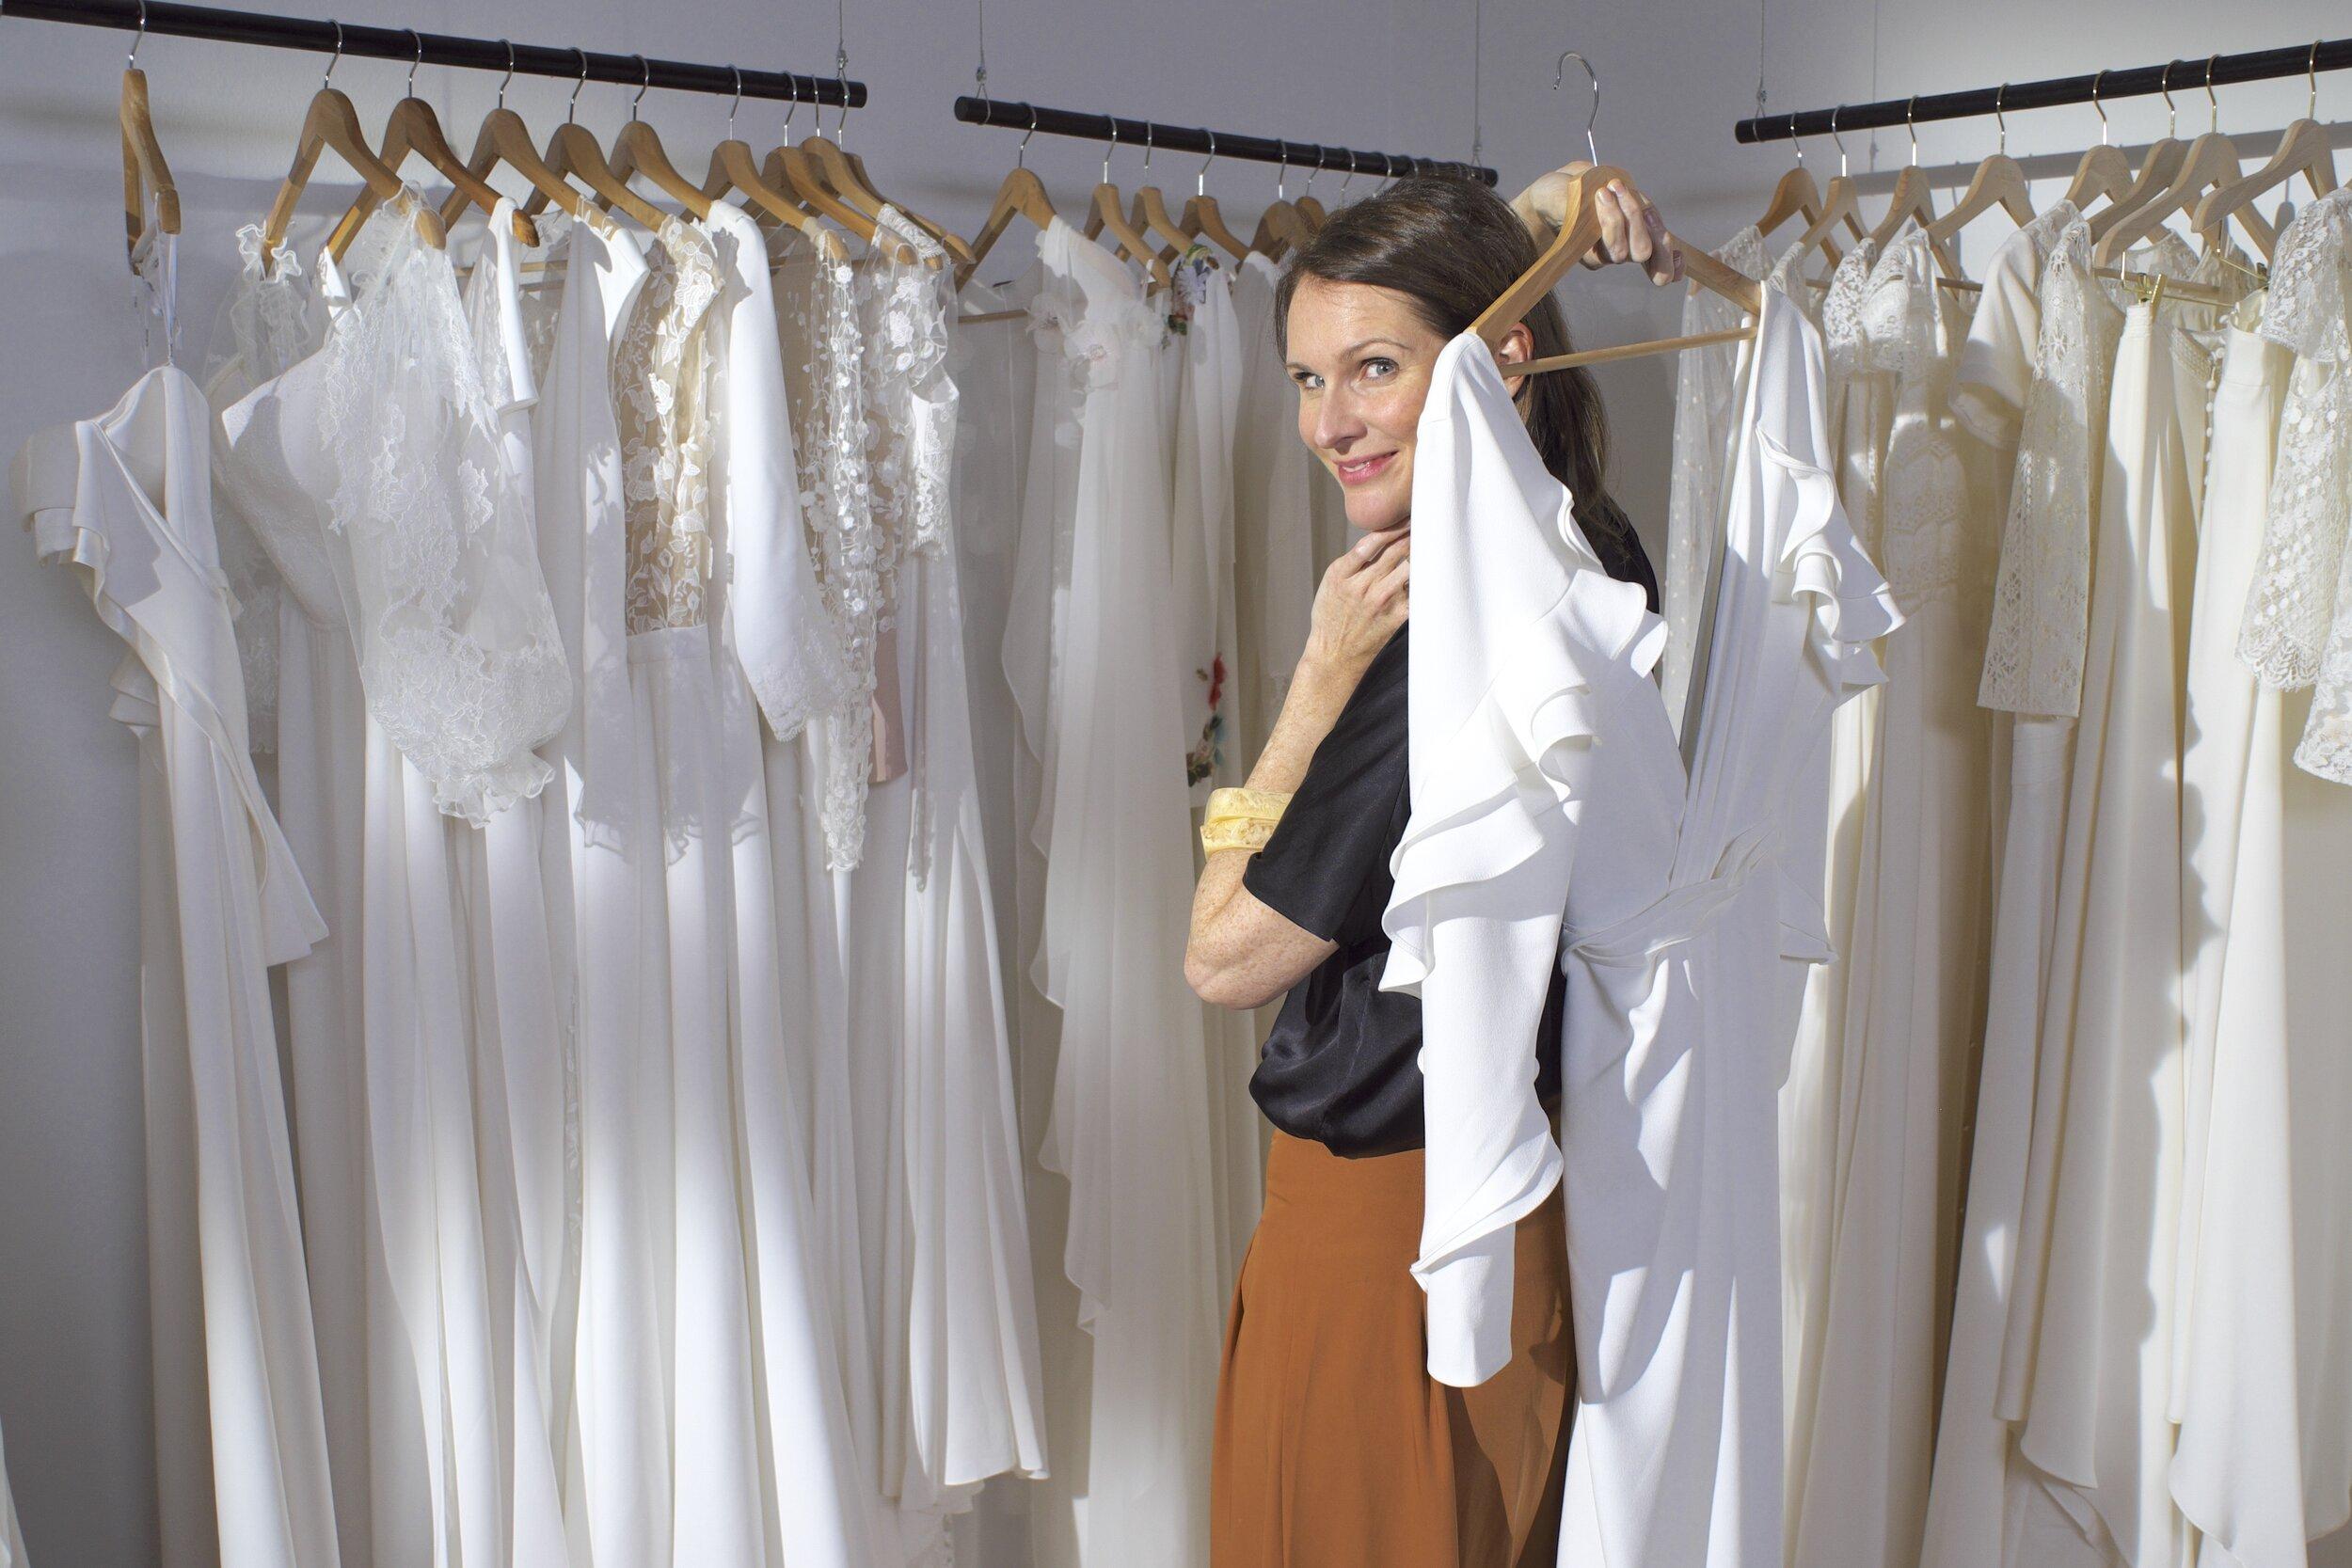 Zoe with Dresses.JPG